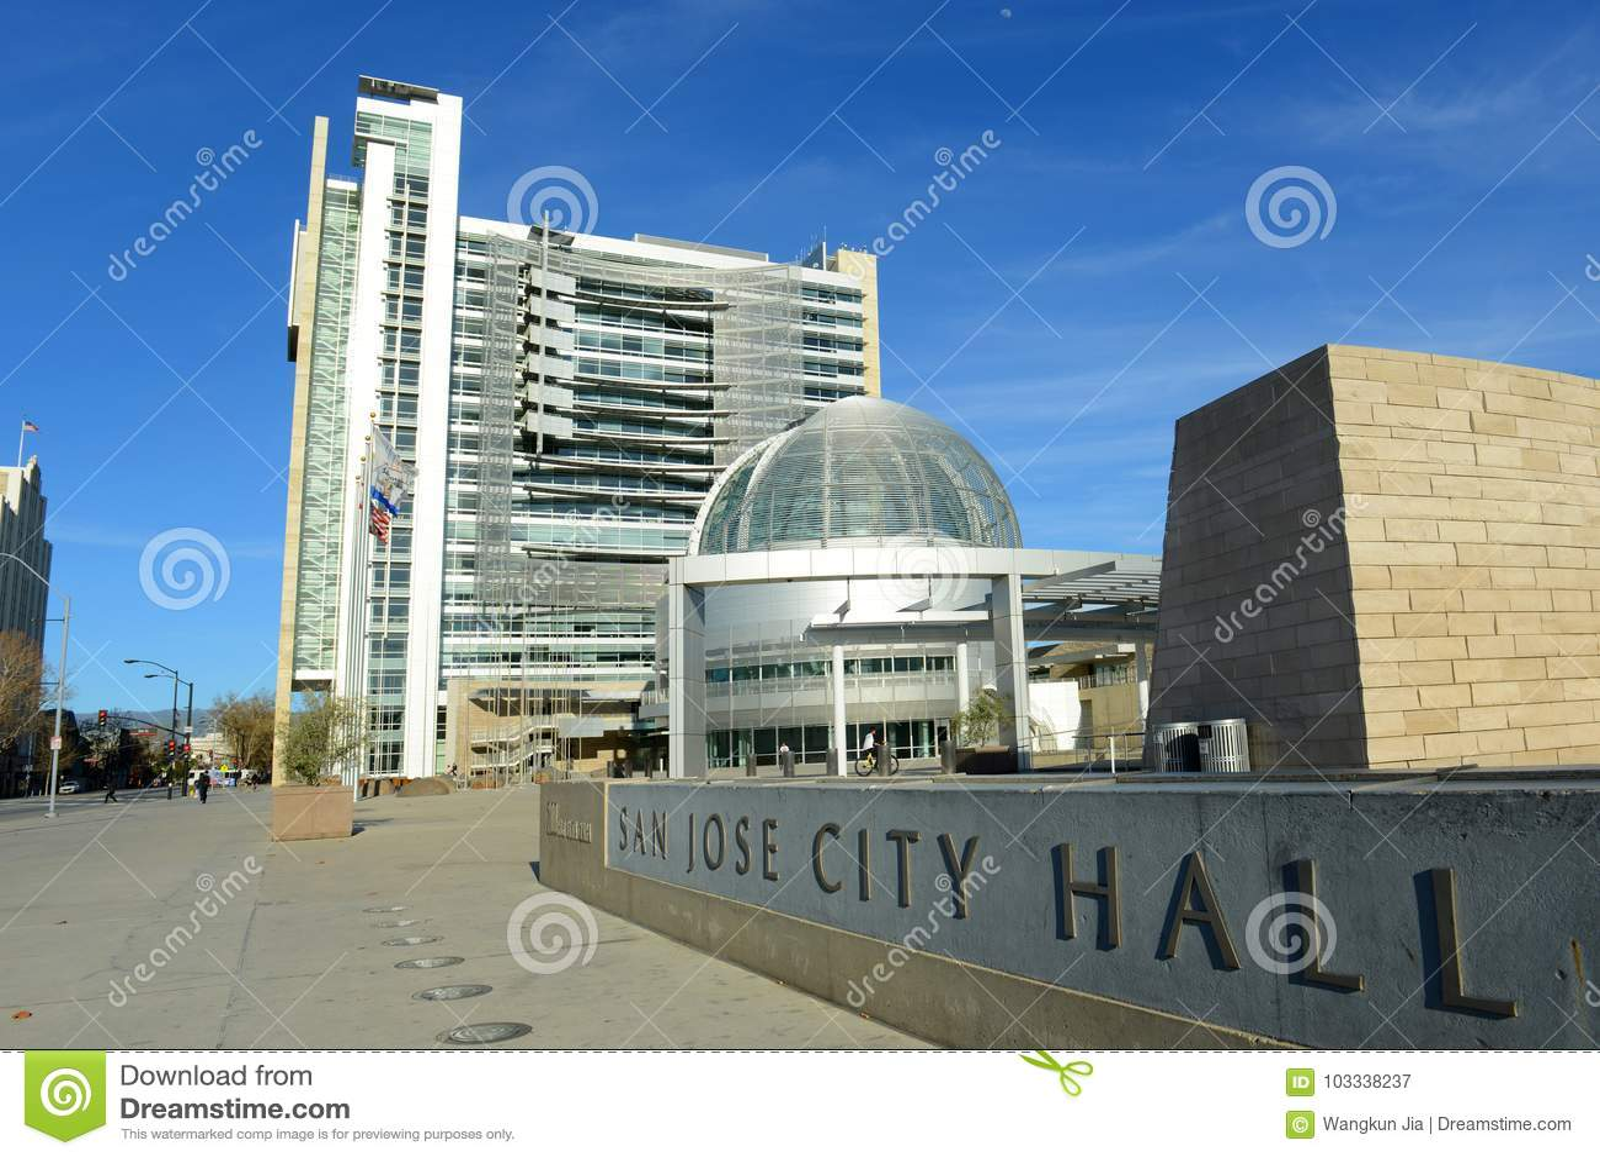 San Jose City Hall, San Jose, Califórnia, EUA